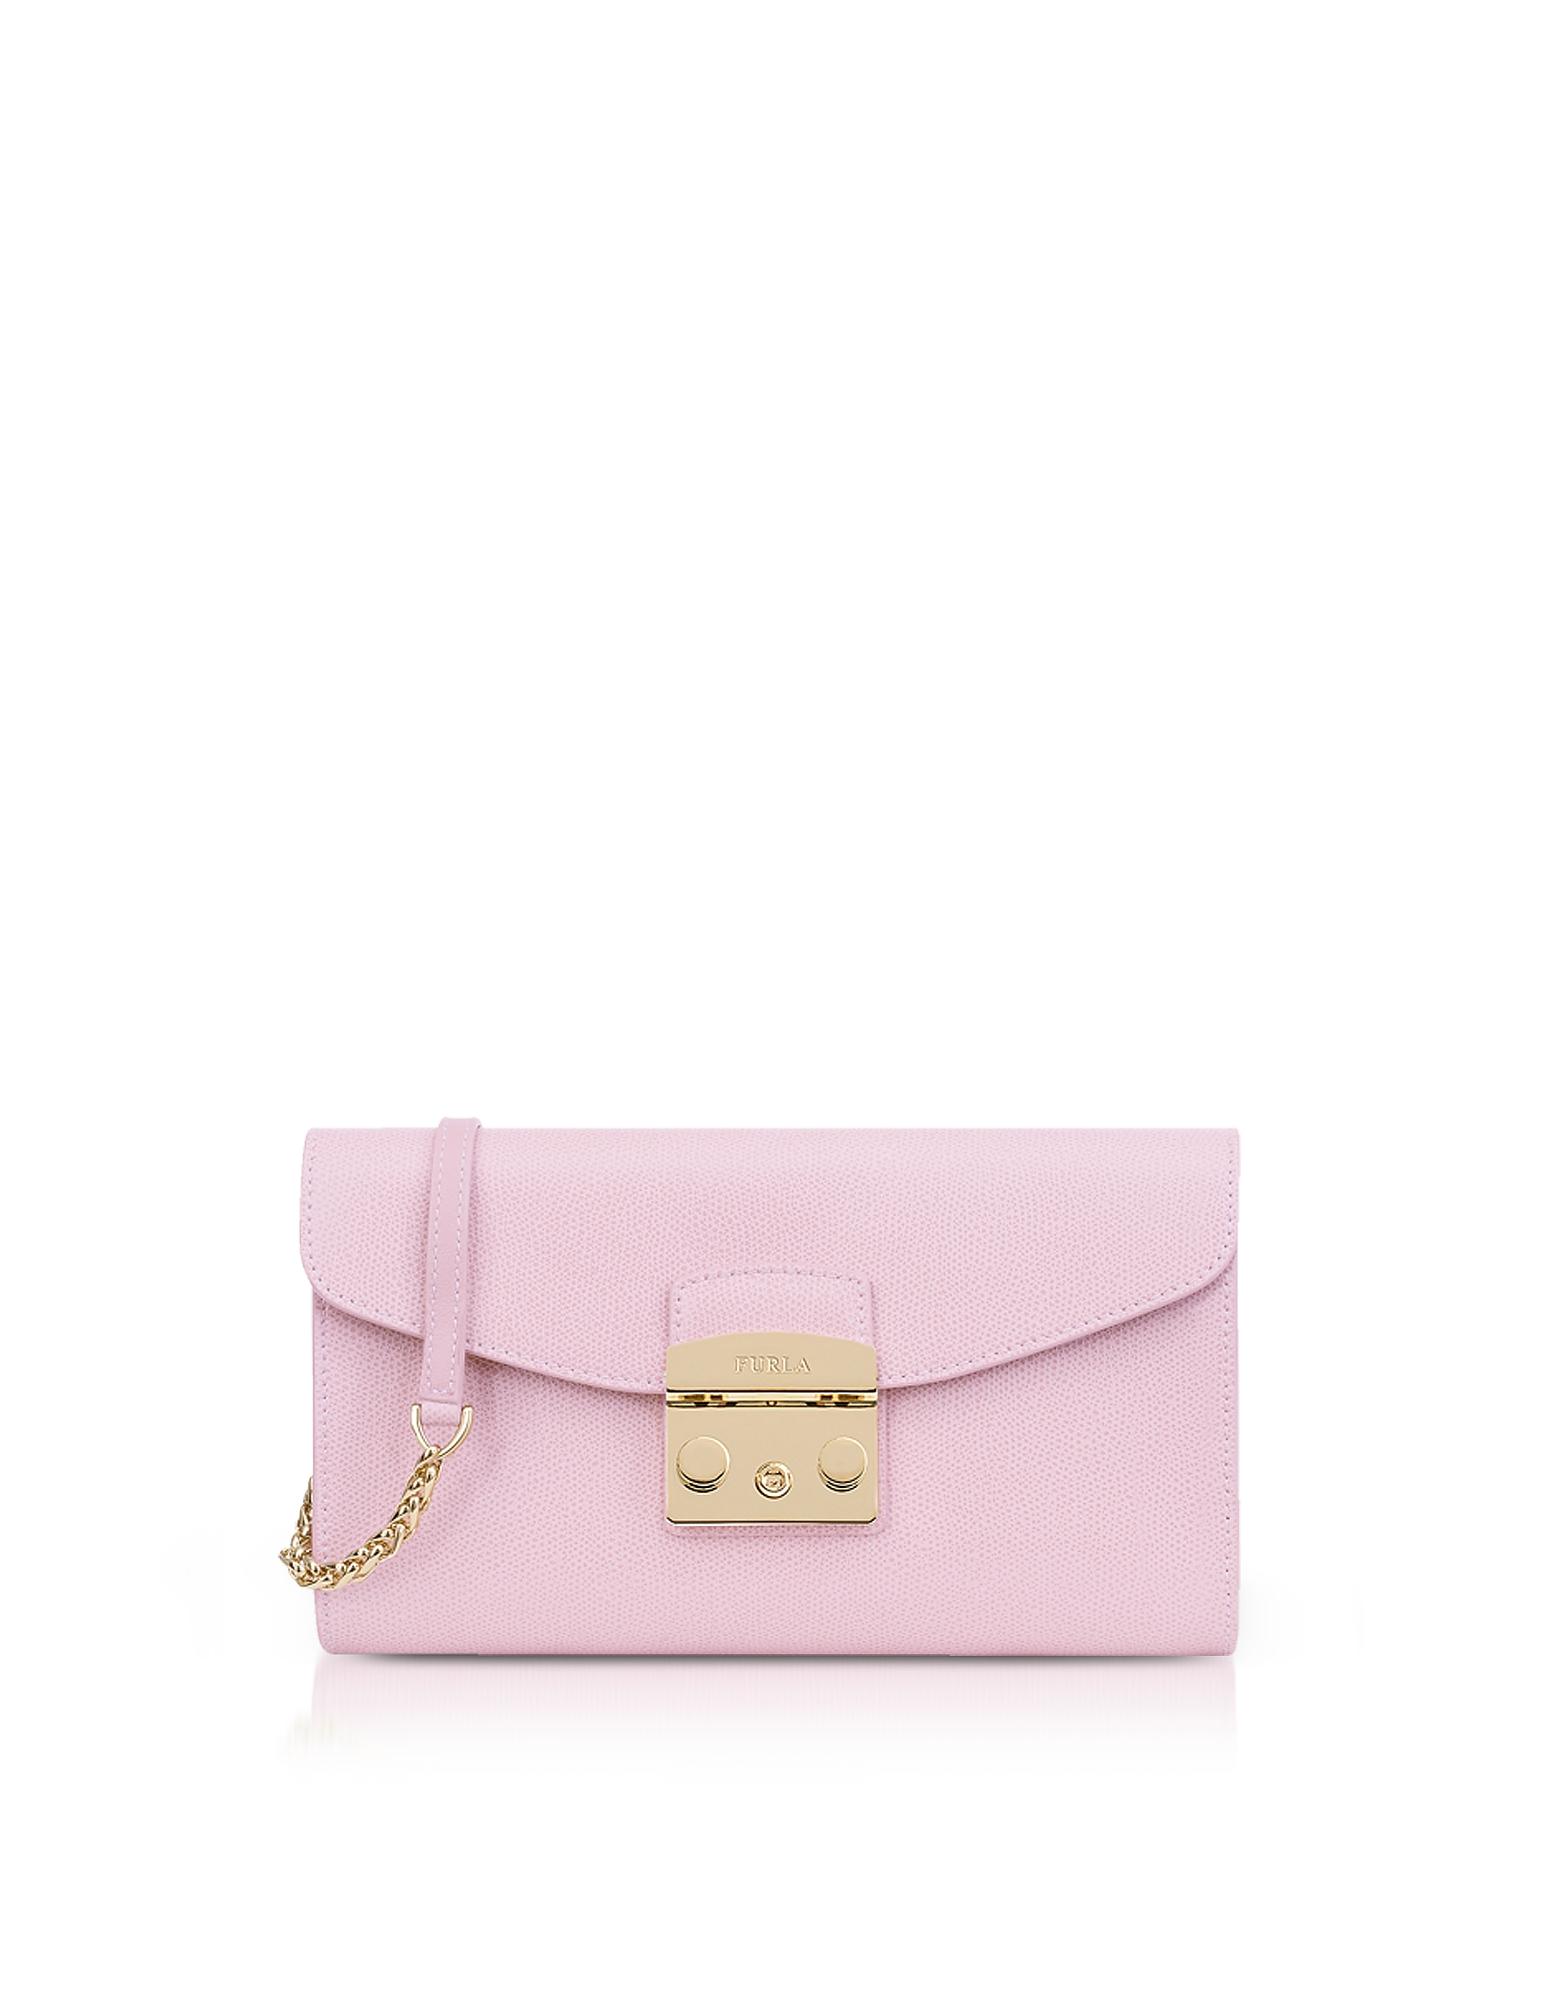 Image of Furla Designer Handbags, Camelia Lizard Printed Leather Metropolis Small Clutch w/Chain Strap